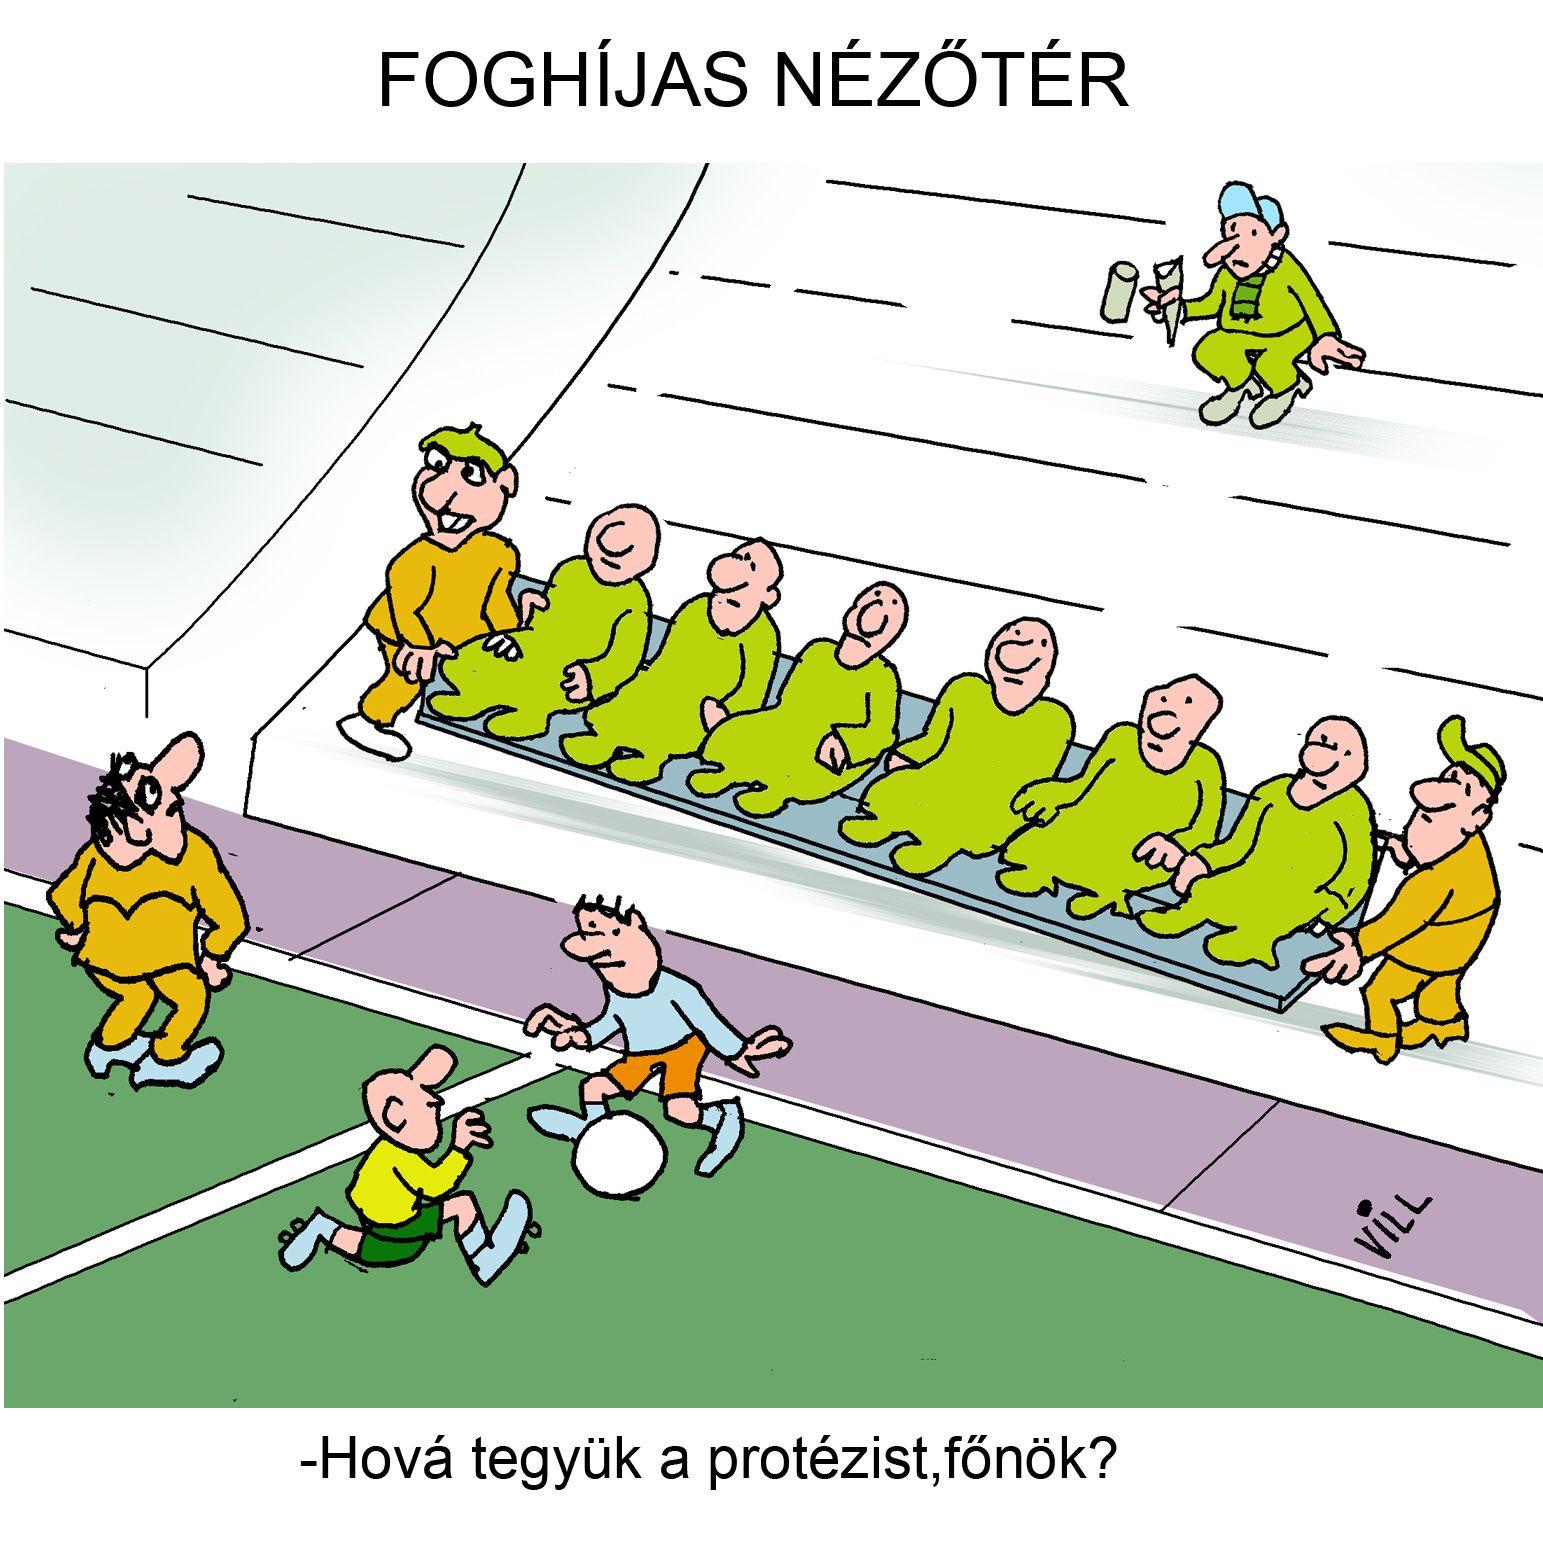 http://m.cdn.blog.hu/al/aludasmatyi/image/foghijas_nezoter.jpg